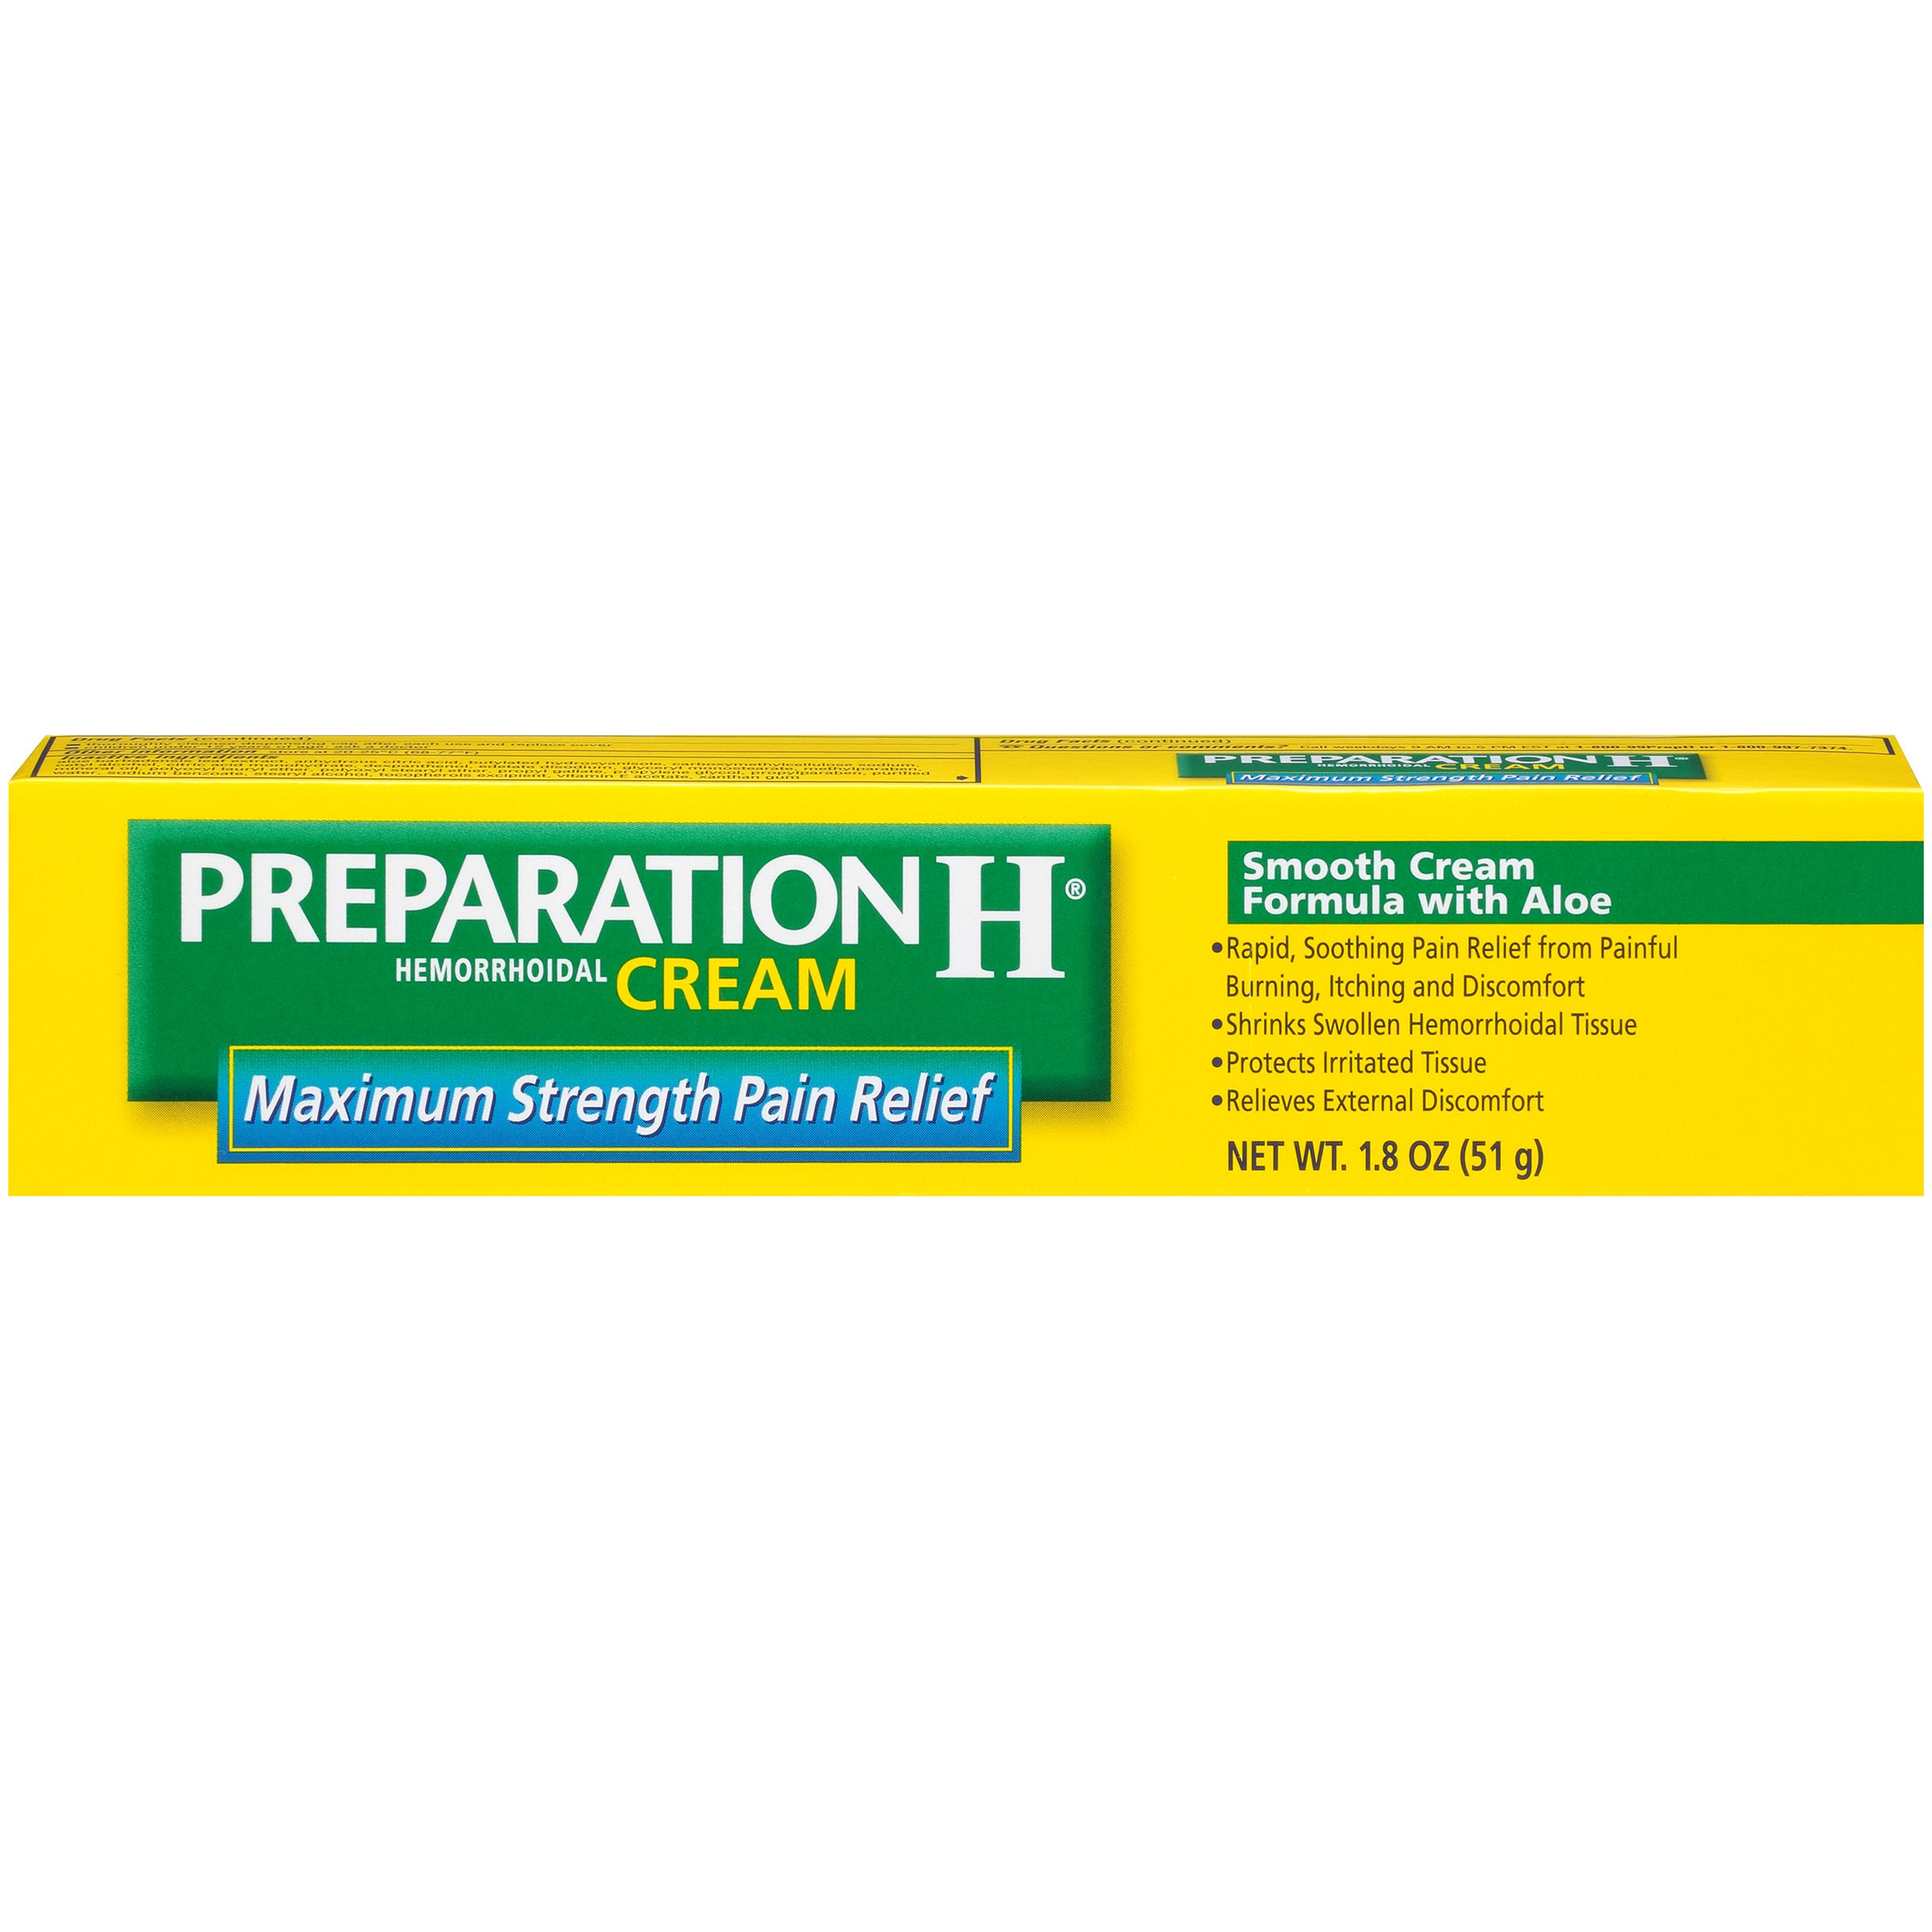 Preparation H Hemorrhoid Symptom Treatment Cream, Maximum Strength Pain Relief with Aloe, Tube (1.8 Ounce) (Pack of 2)